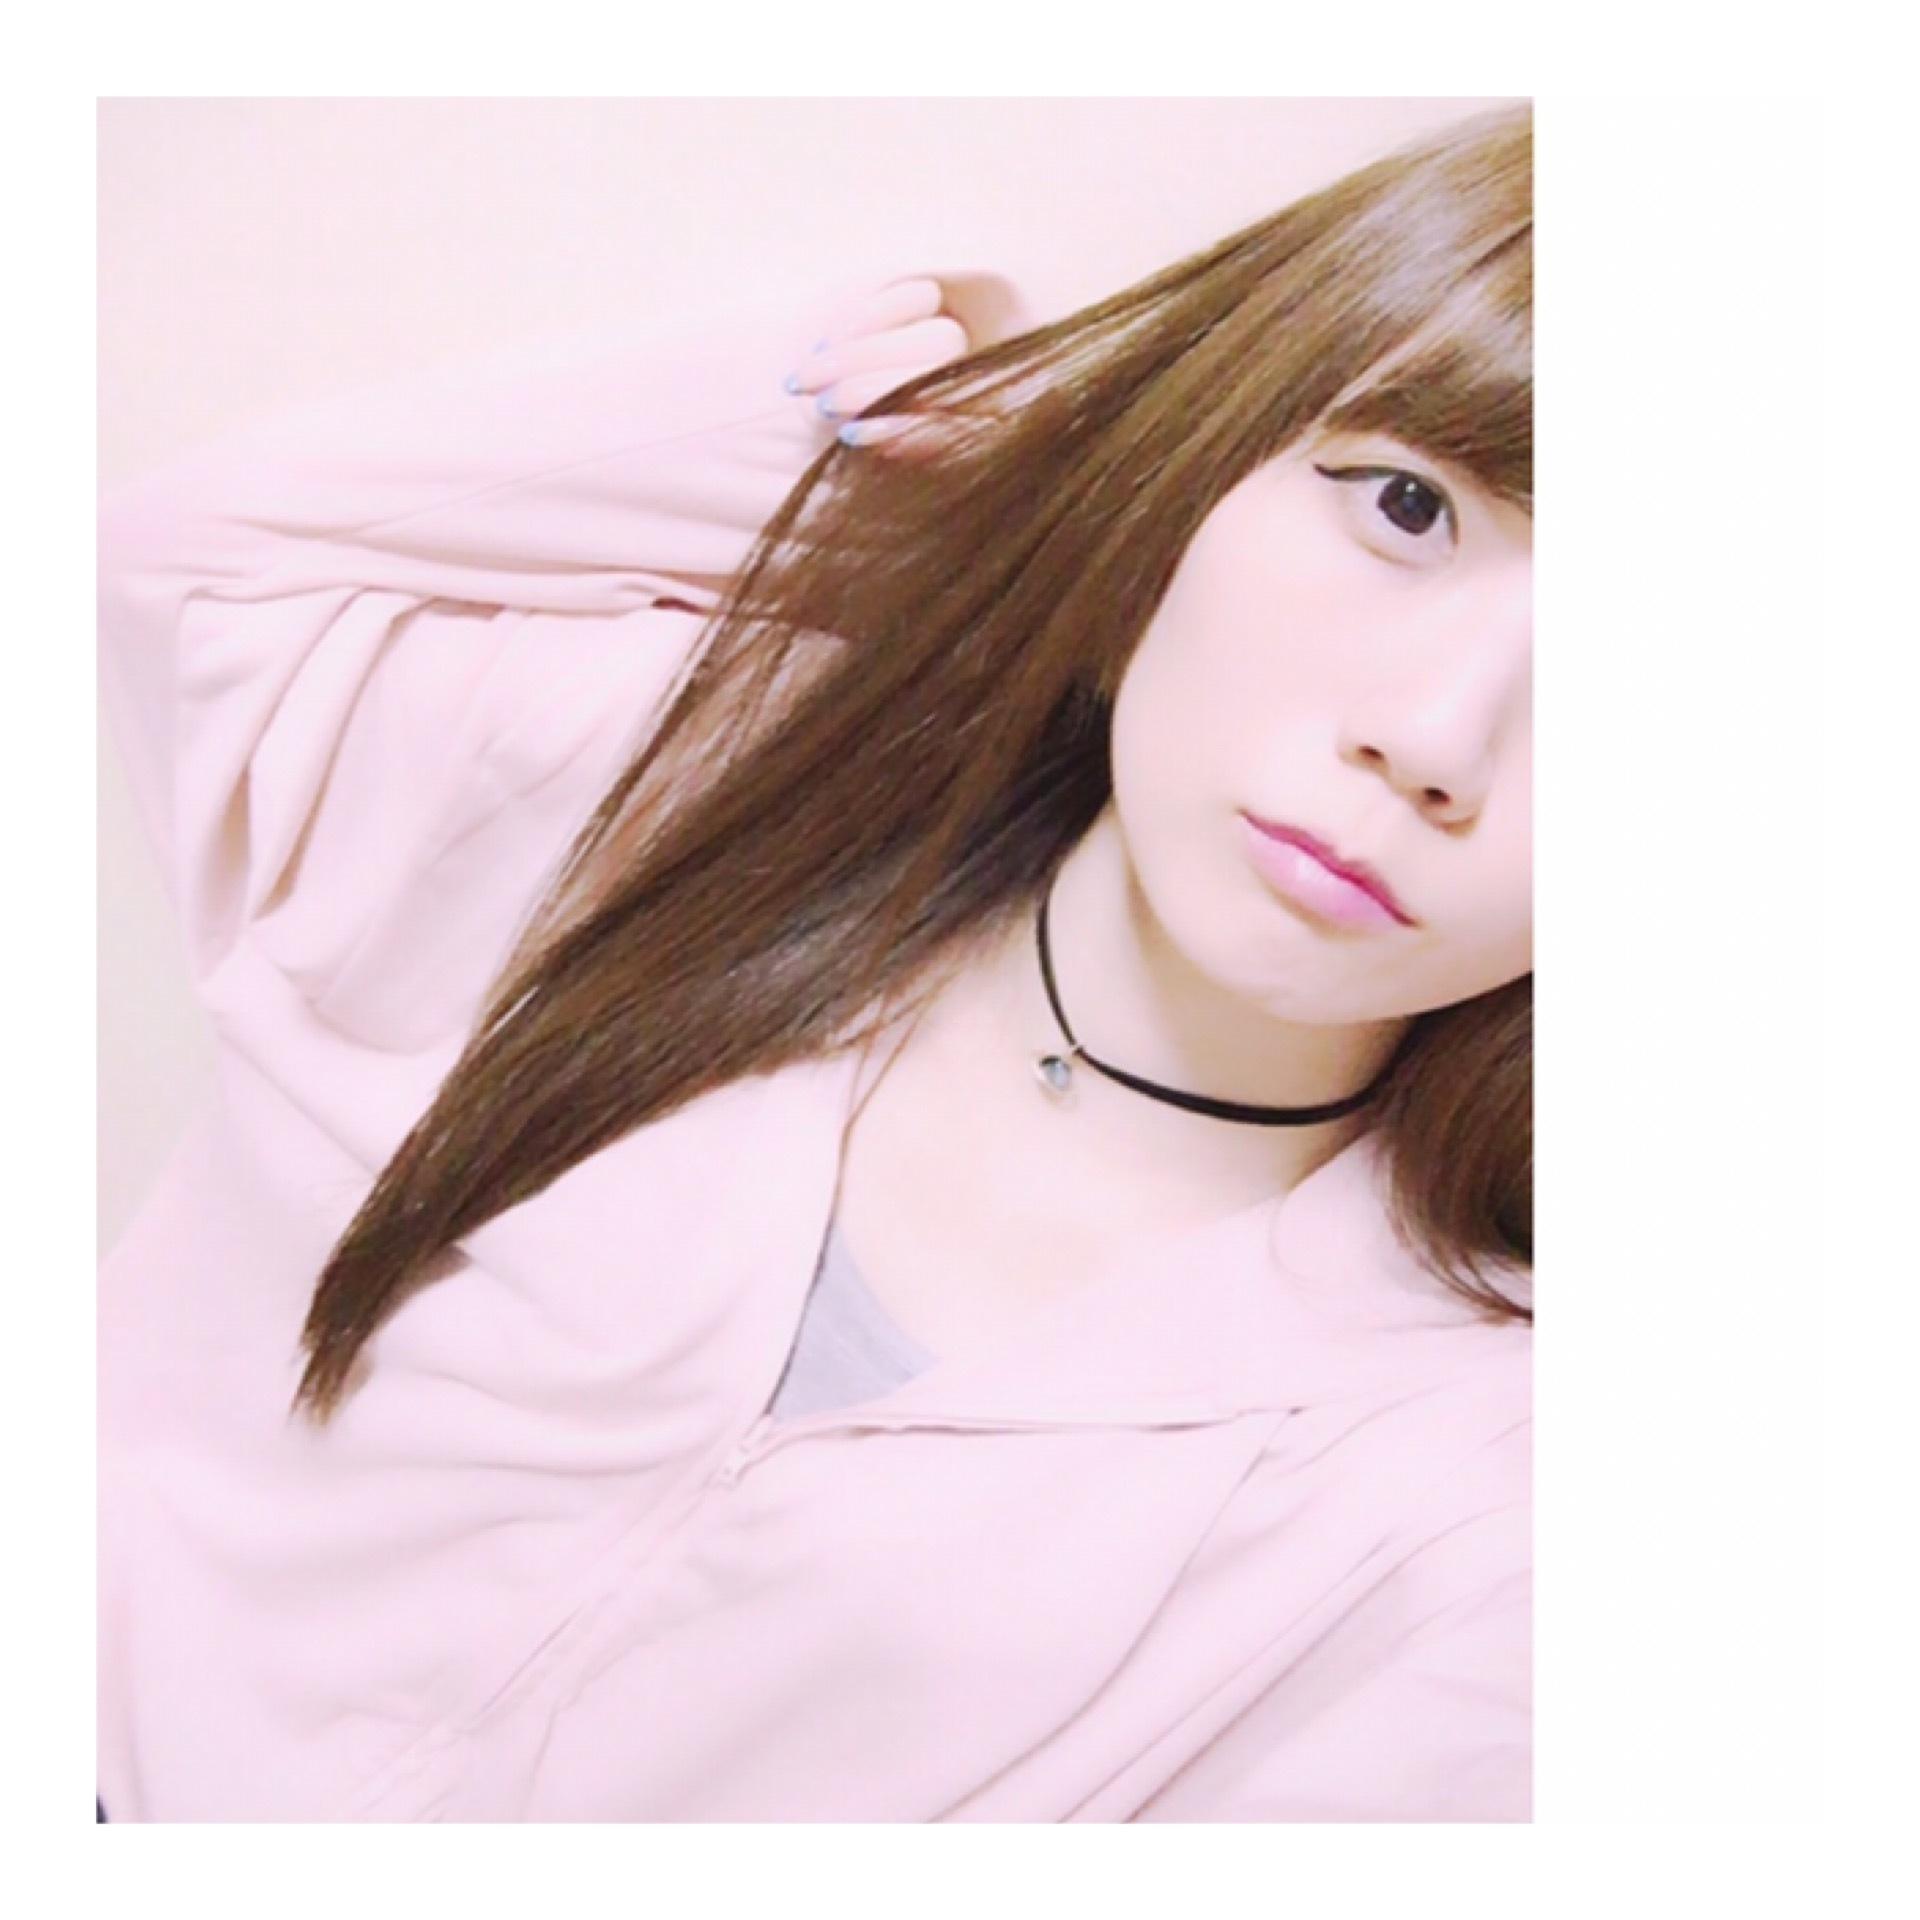 E hyphen world gallery♡ファッション通販サイト《FLAG SHOP》購入品2♩_1_2